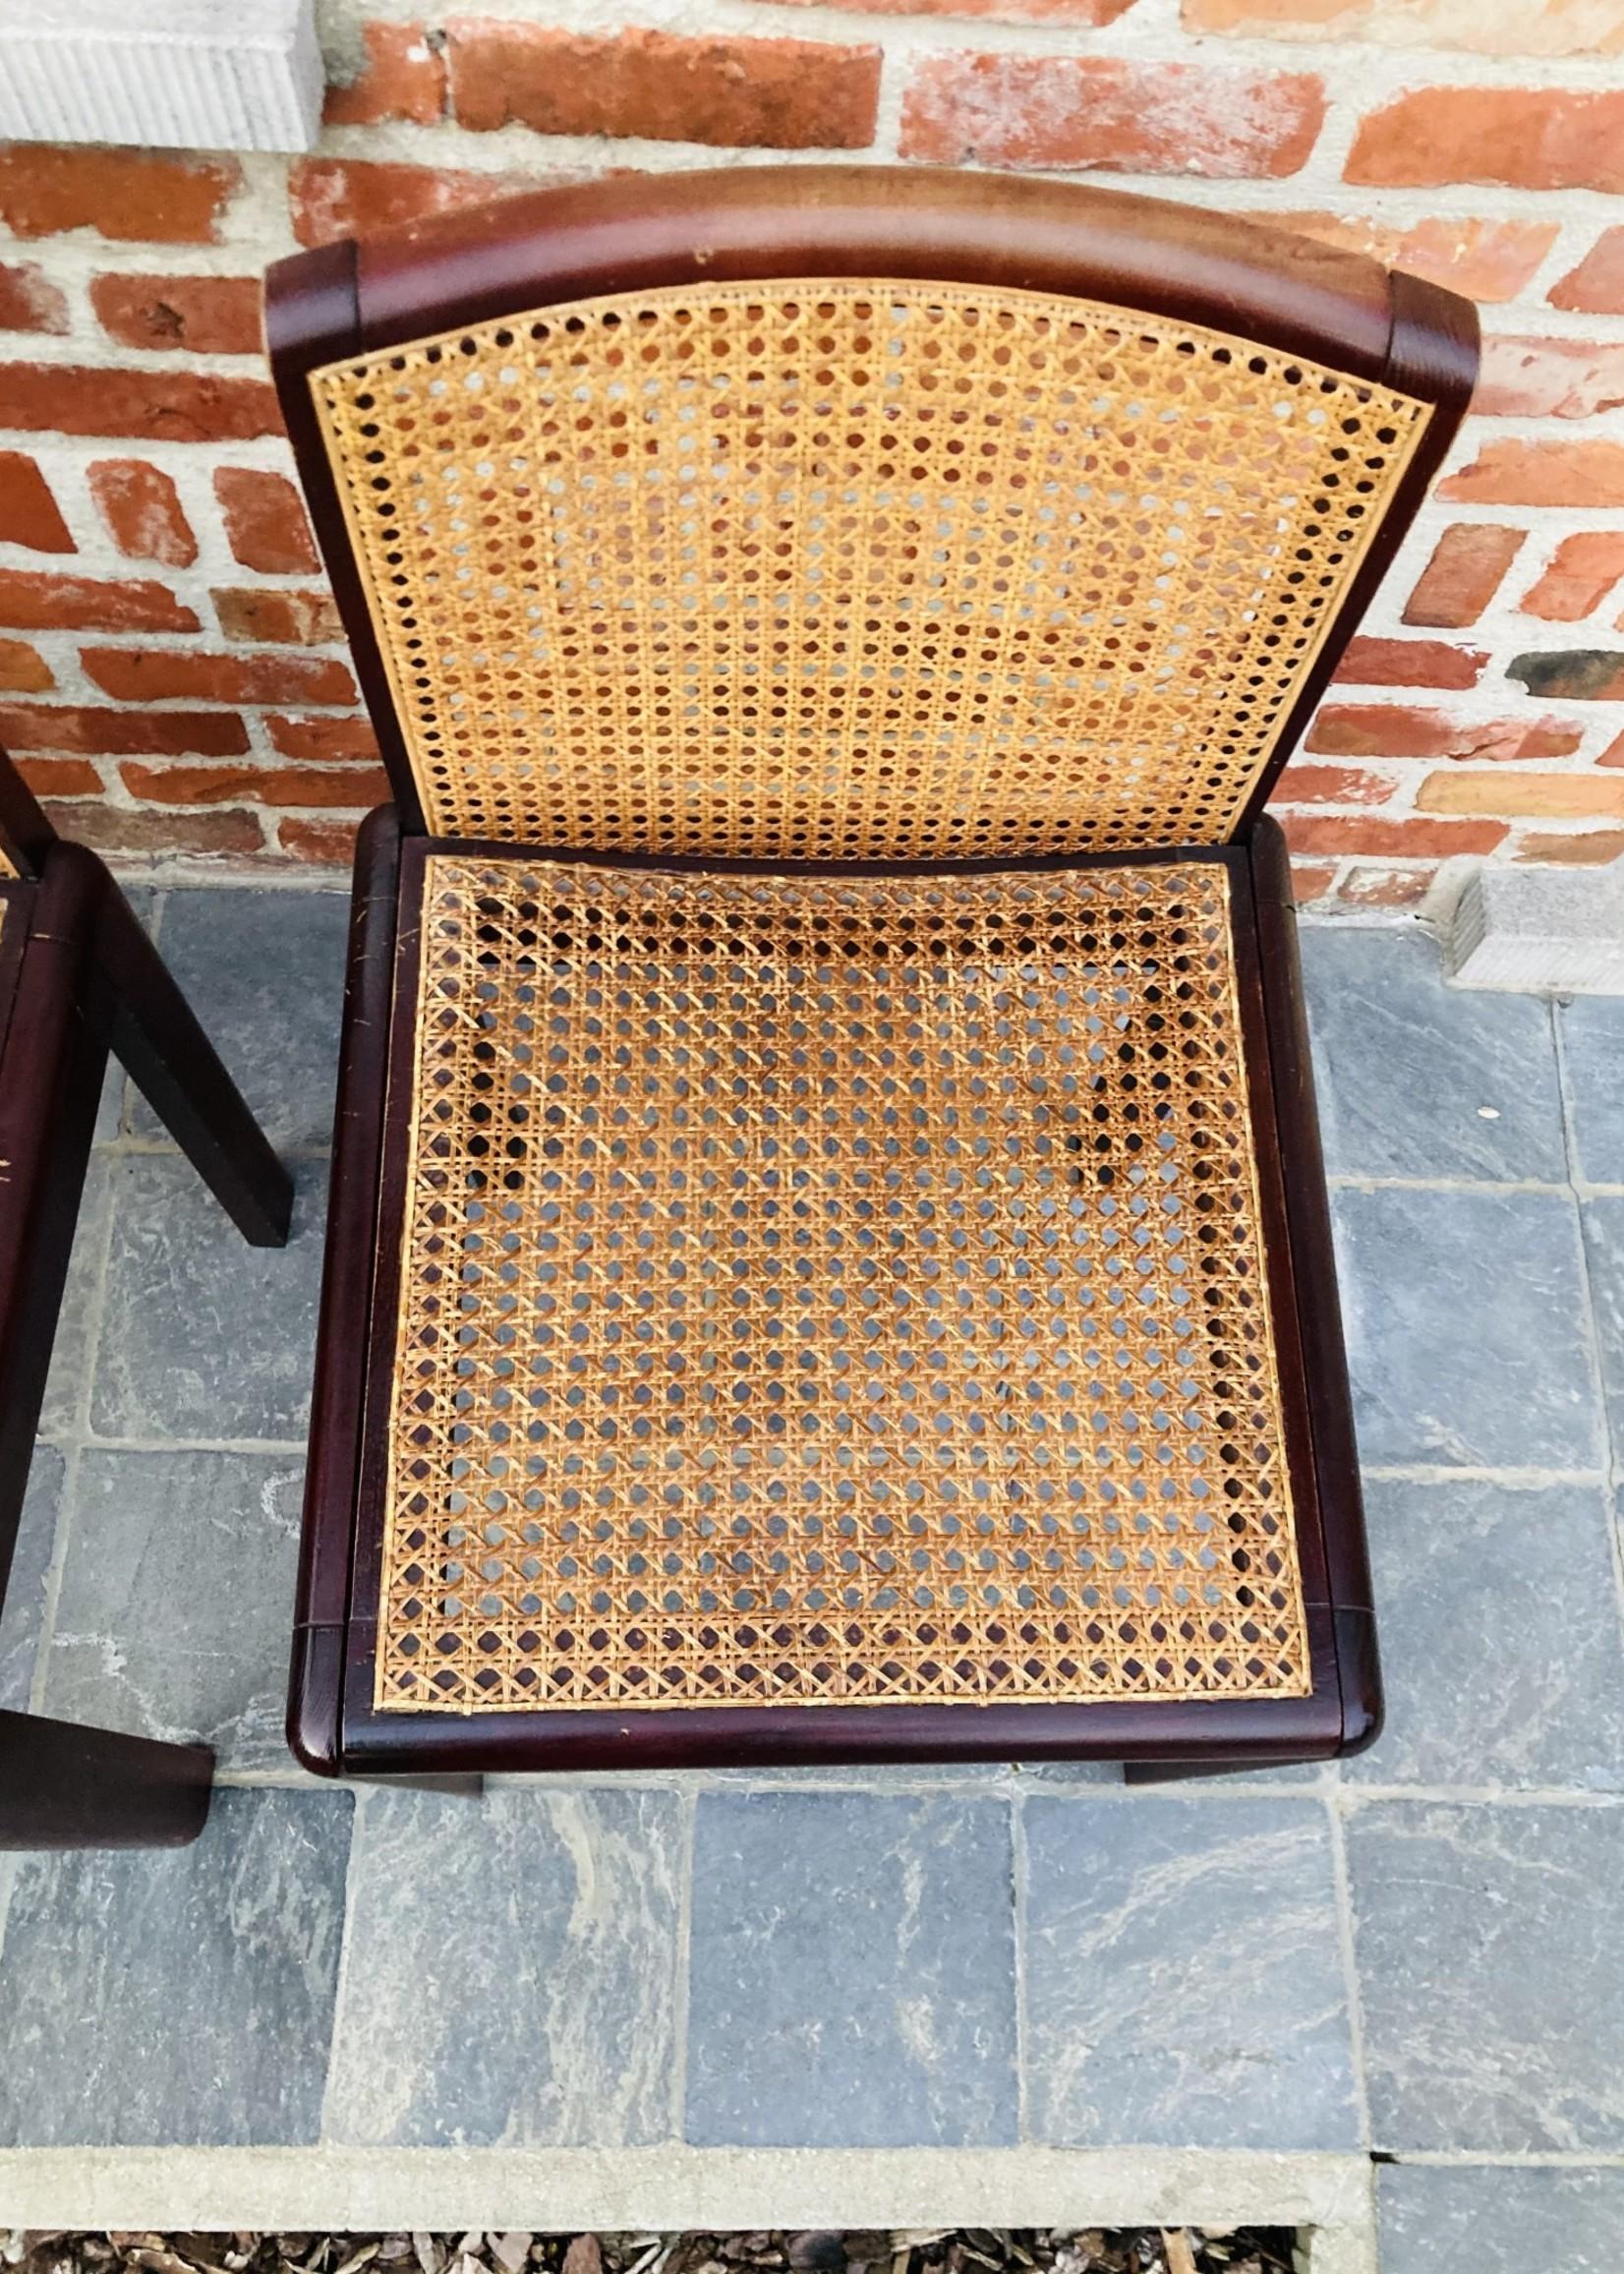 Italian dark wooden and rattan chairs